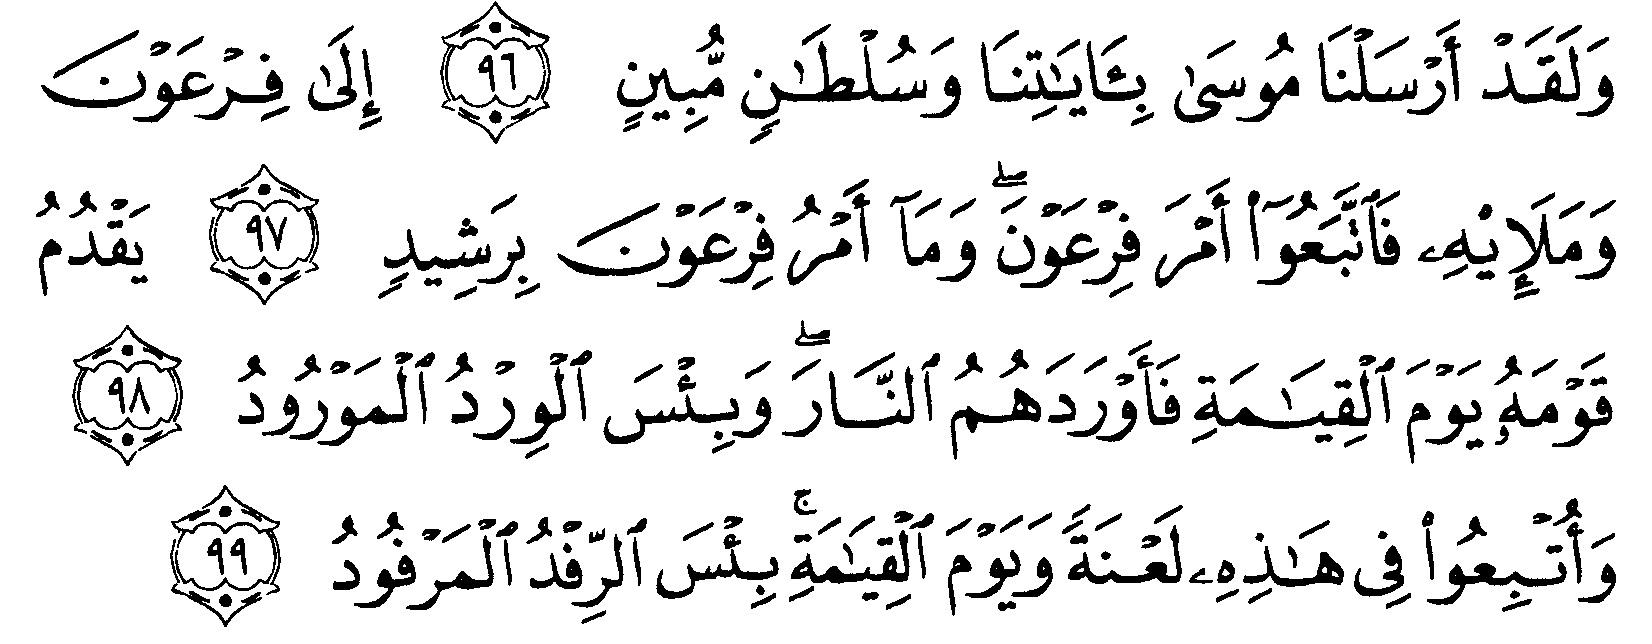 Tafsir Ibnu Katsir Surah Huud Ayat 96 99 Alquranmulia